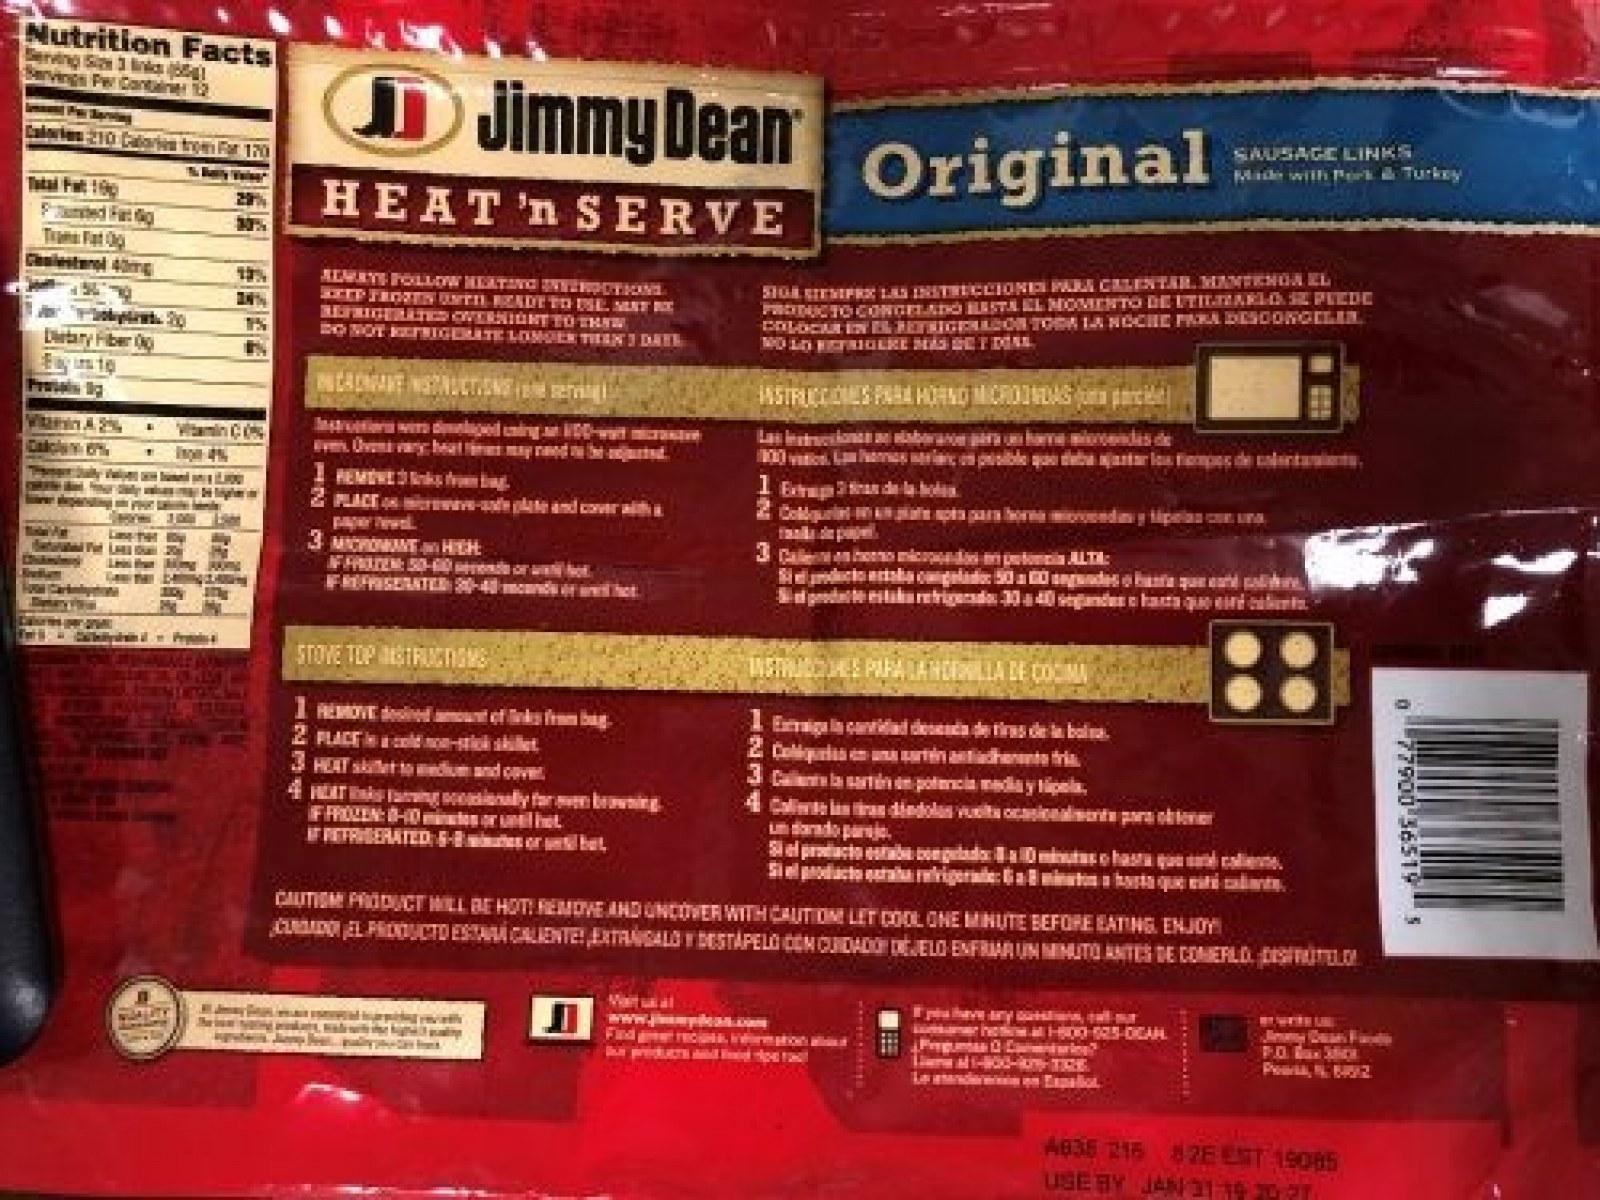 Jimmy Dean Sausage Recall: Heat 'N